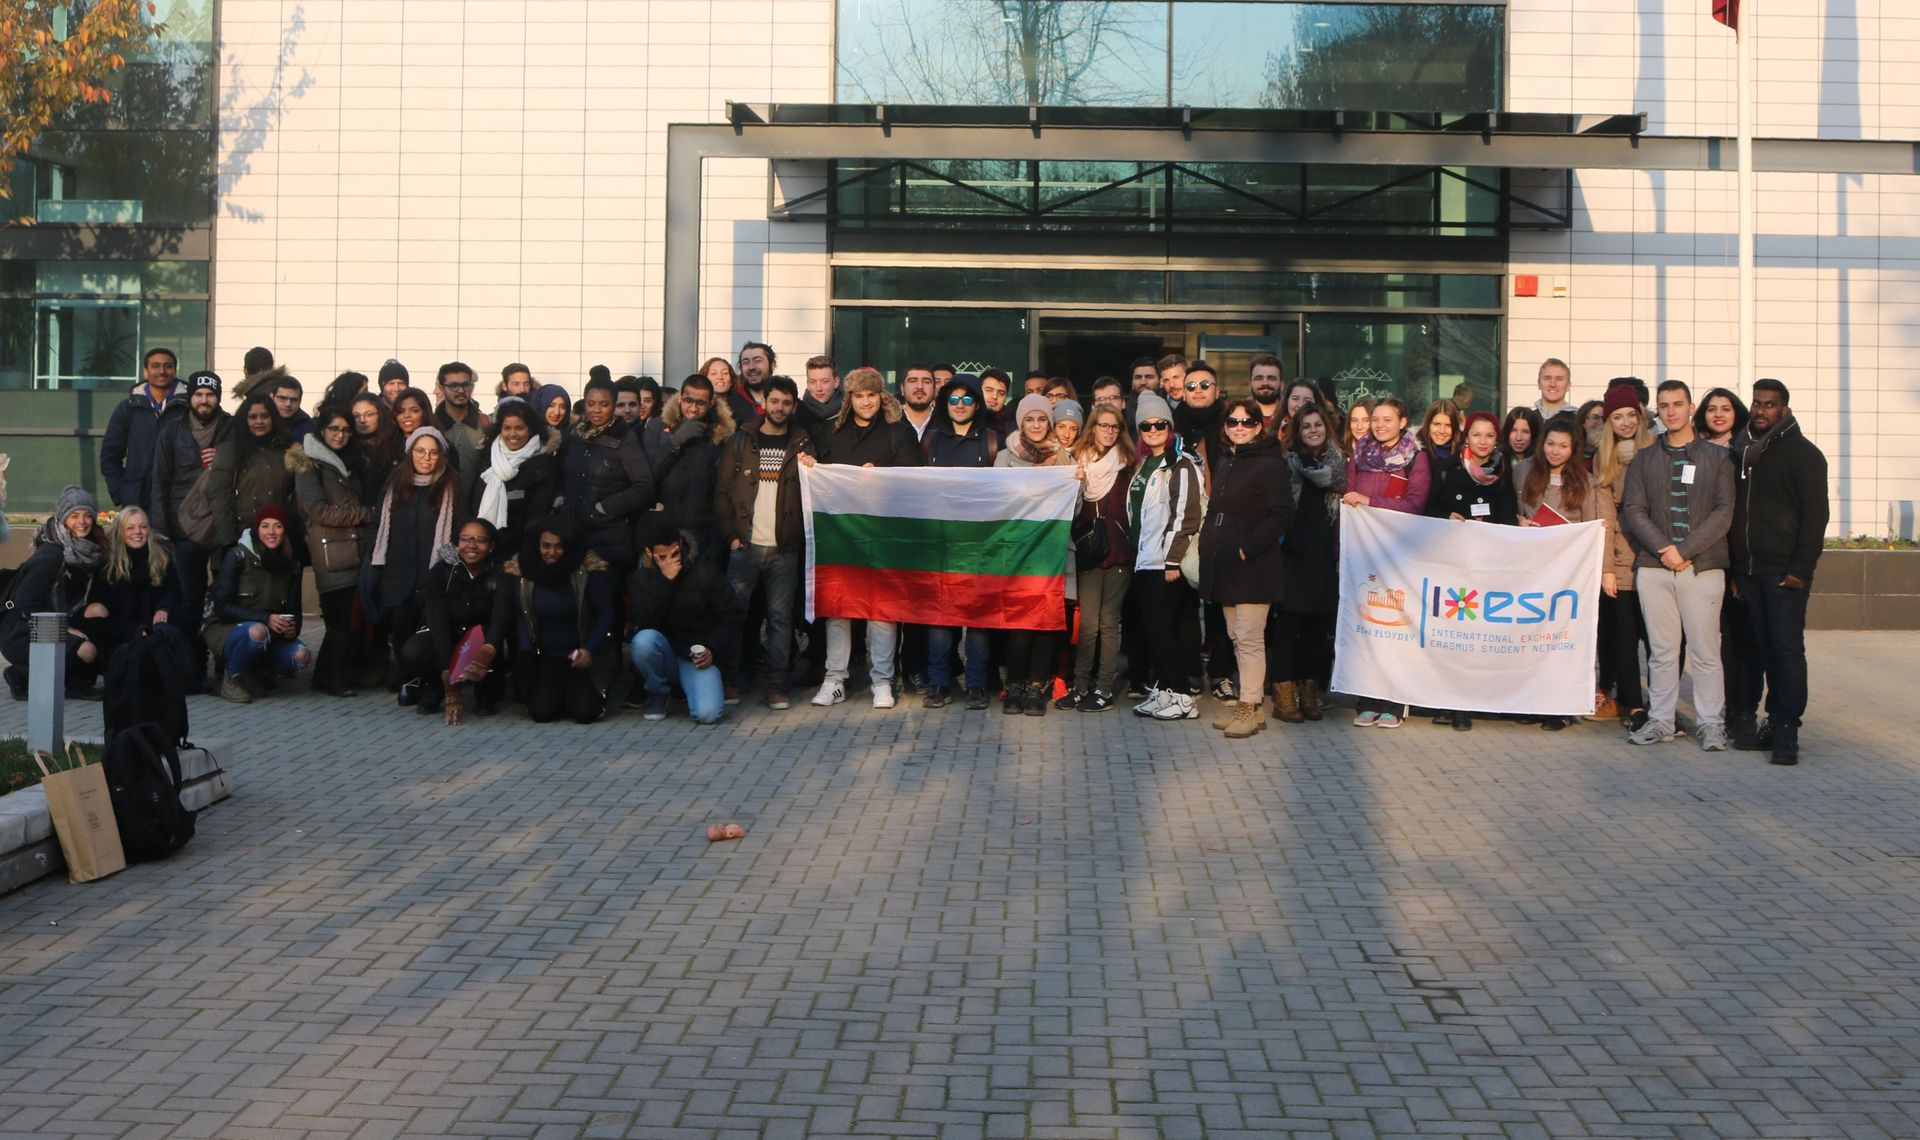 Erasmus Student Network - Plovdiv